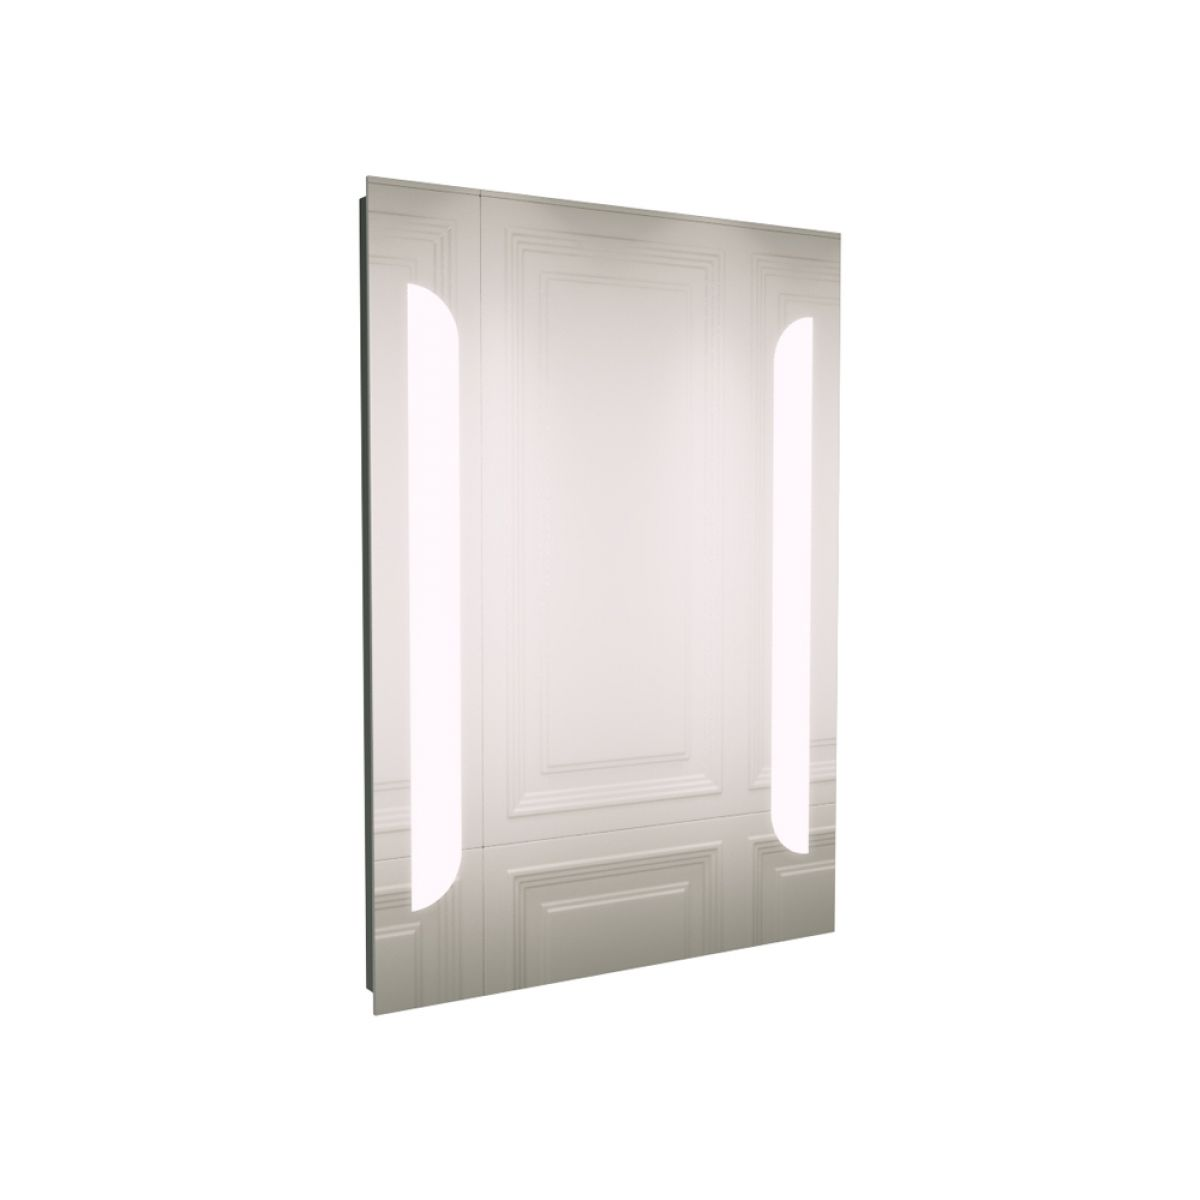 Cassellie Oxygen LED Bathroom Mirror